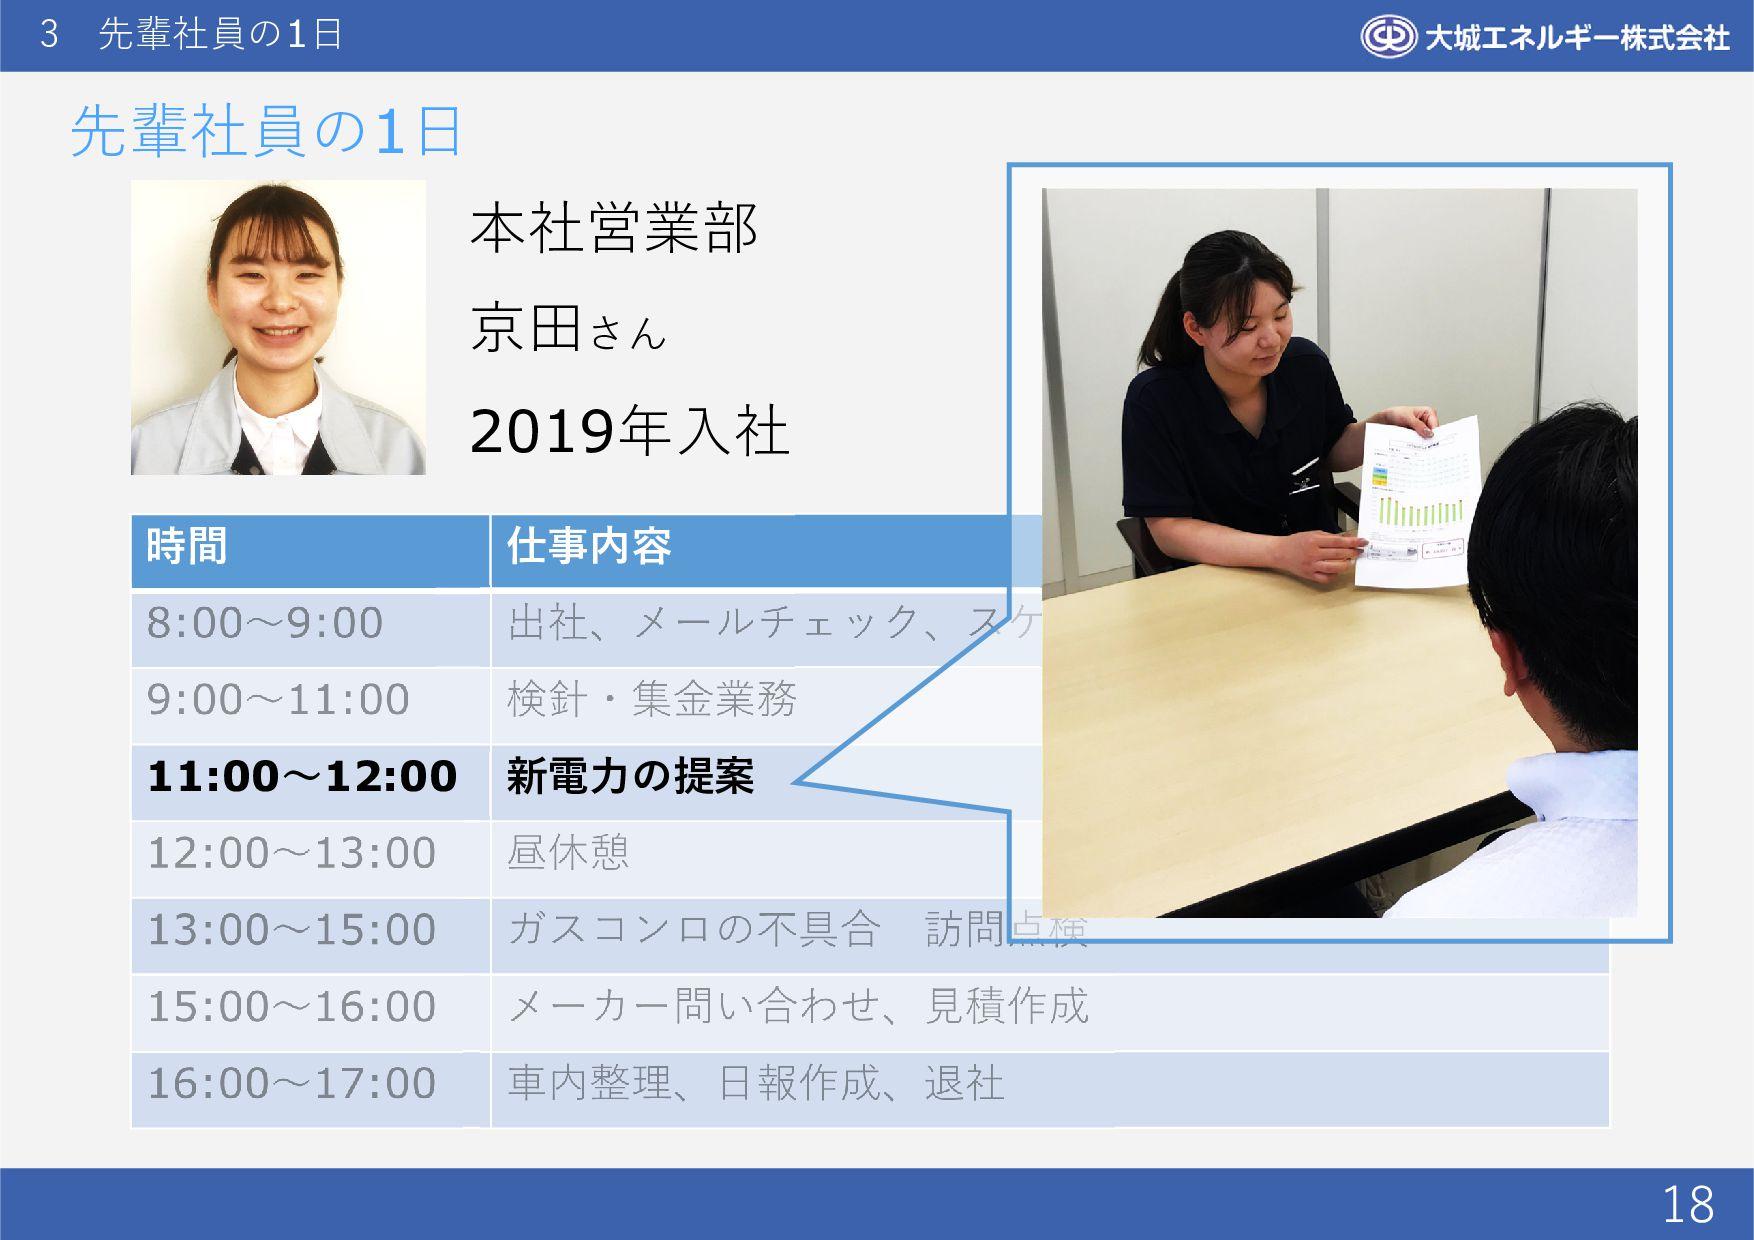 時間 仕事内容 11:00~12:00 新電力の提案 3 先輩社員の1日 18 先輩社員の1日...